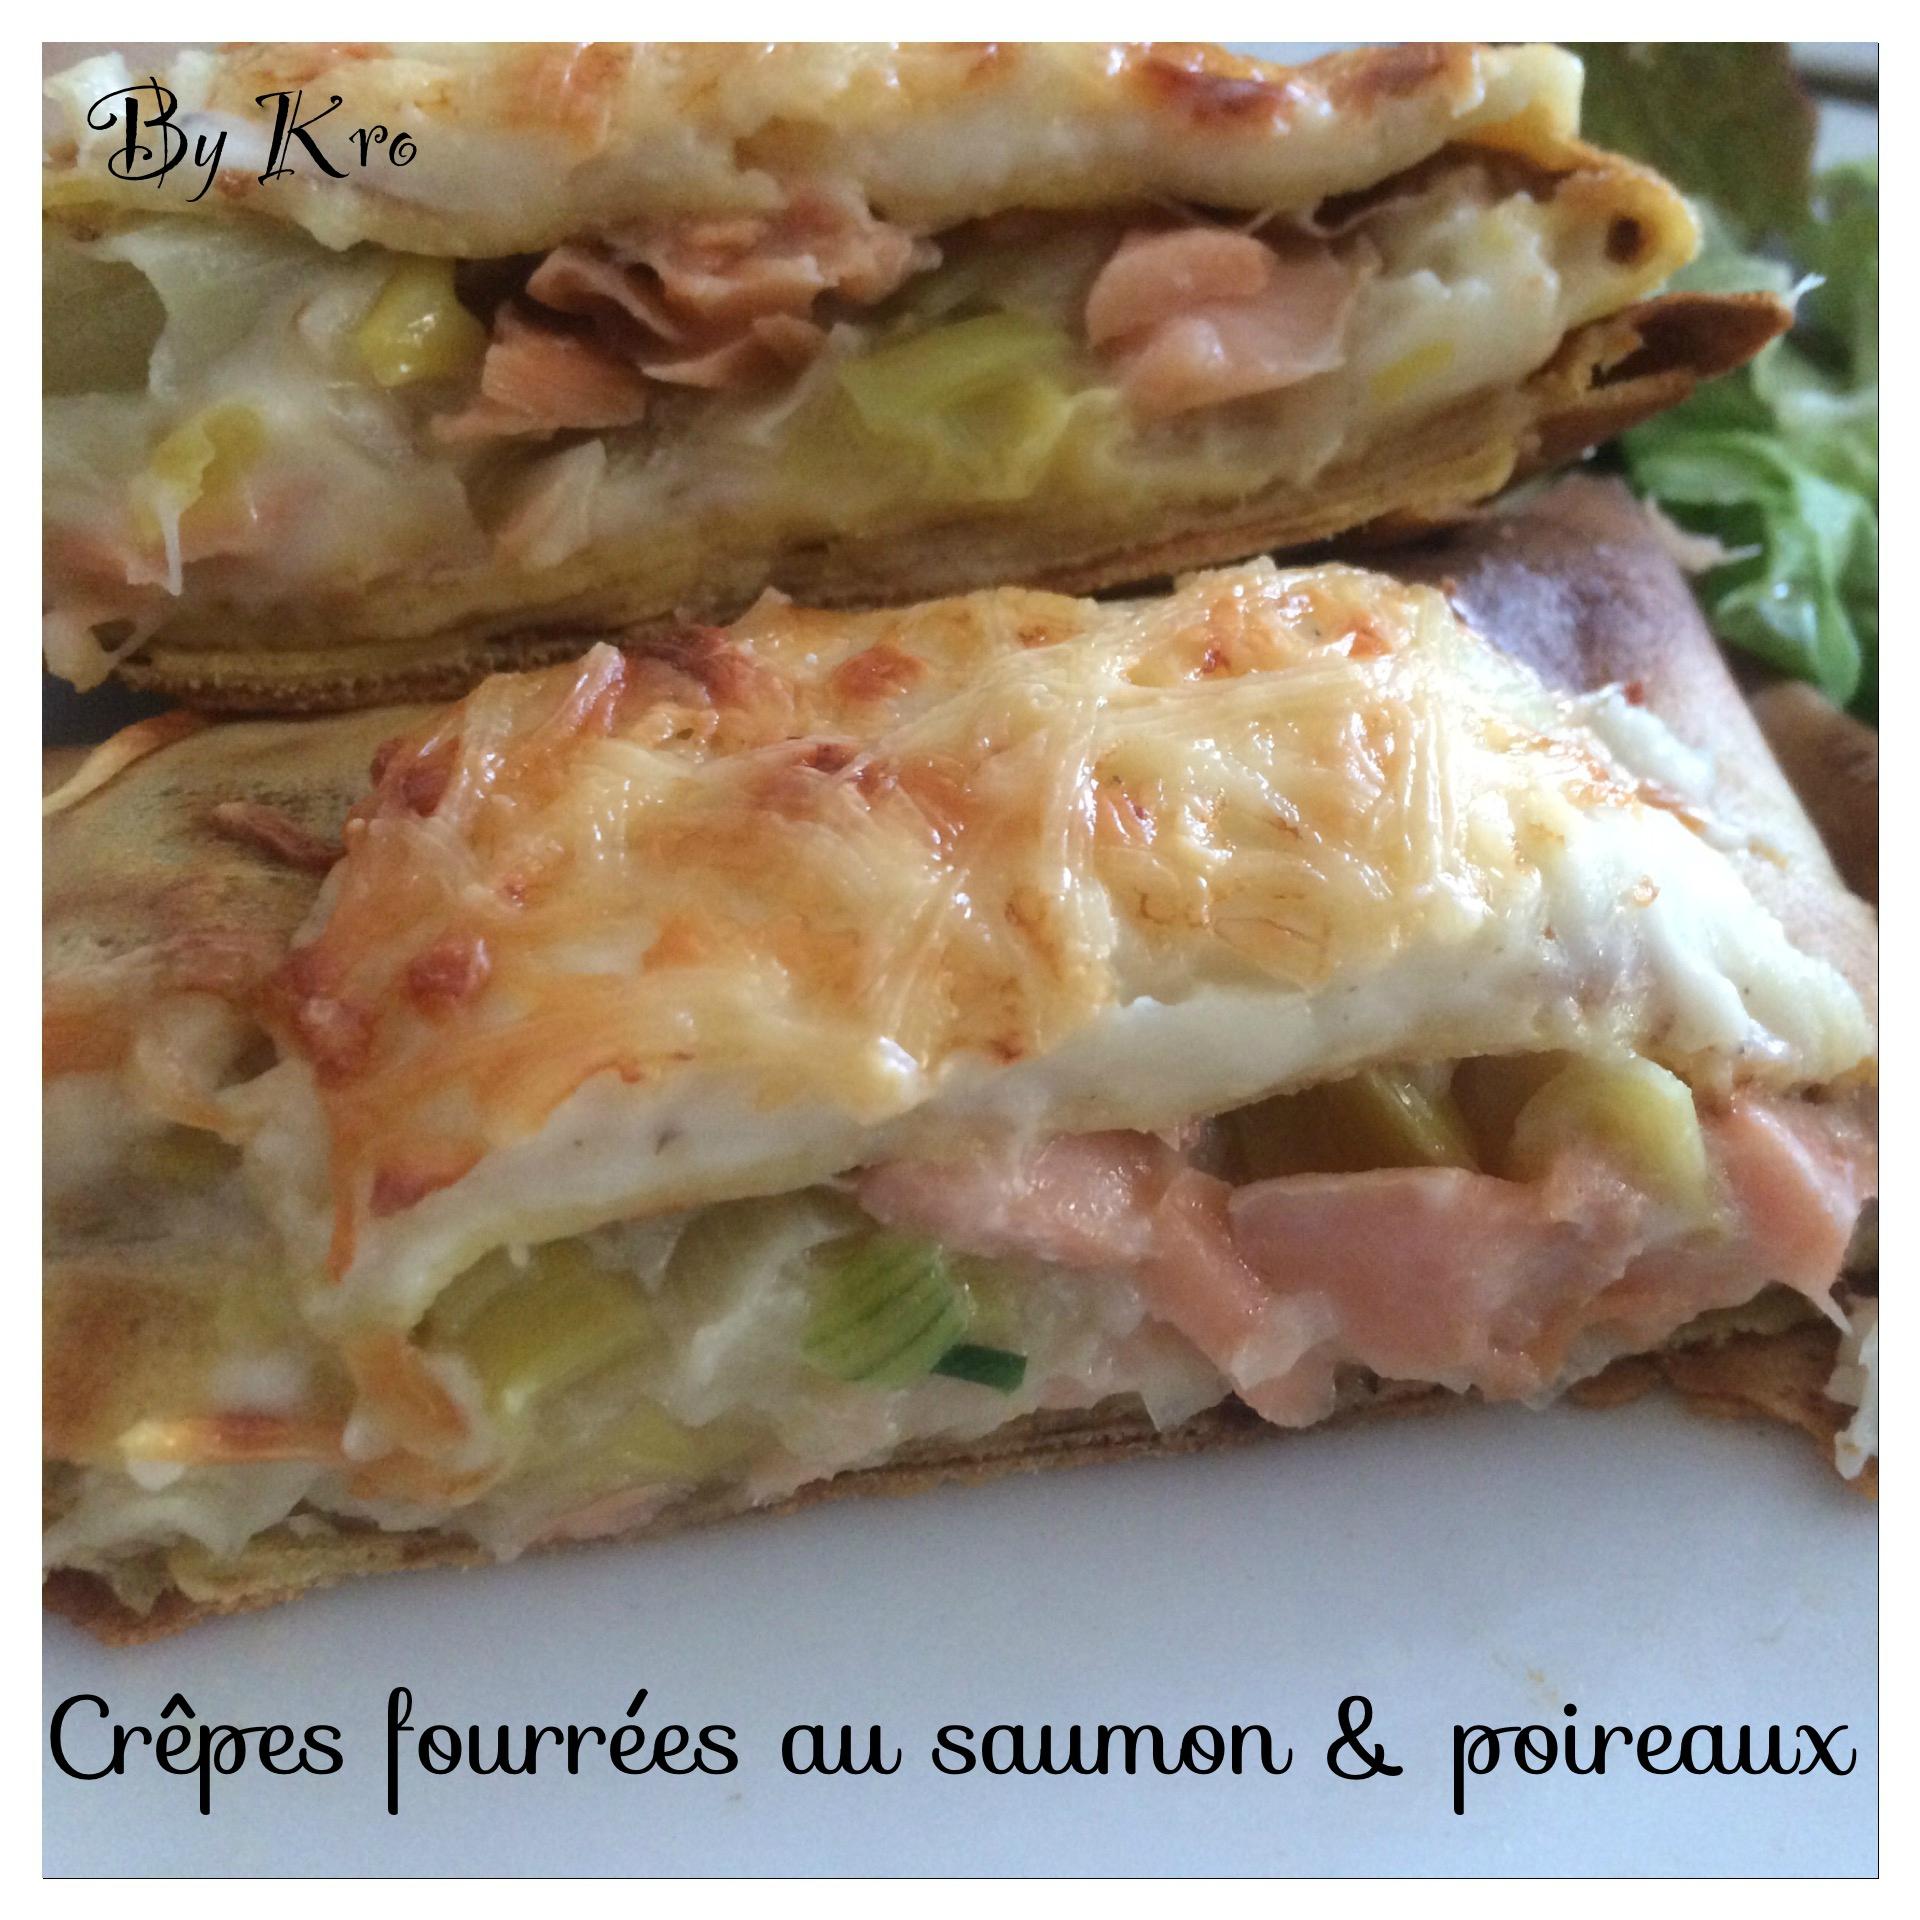 crepe-ou-galette-fourree-bechamel-fromage enceinte